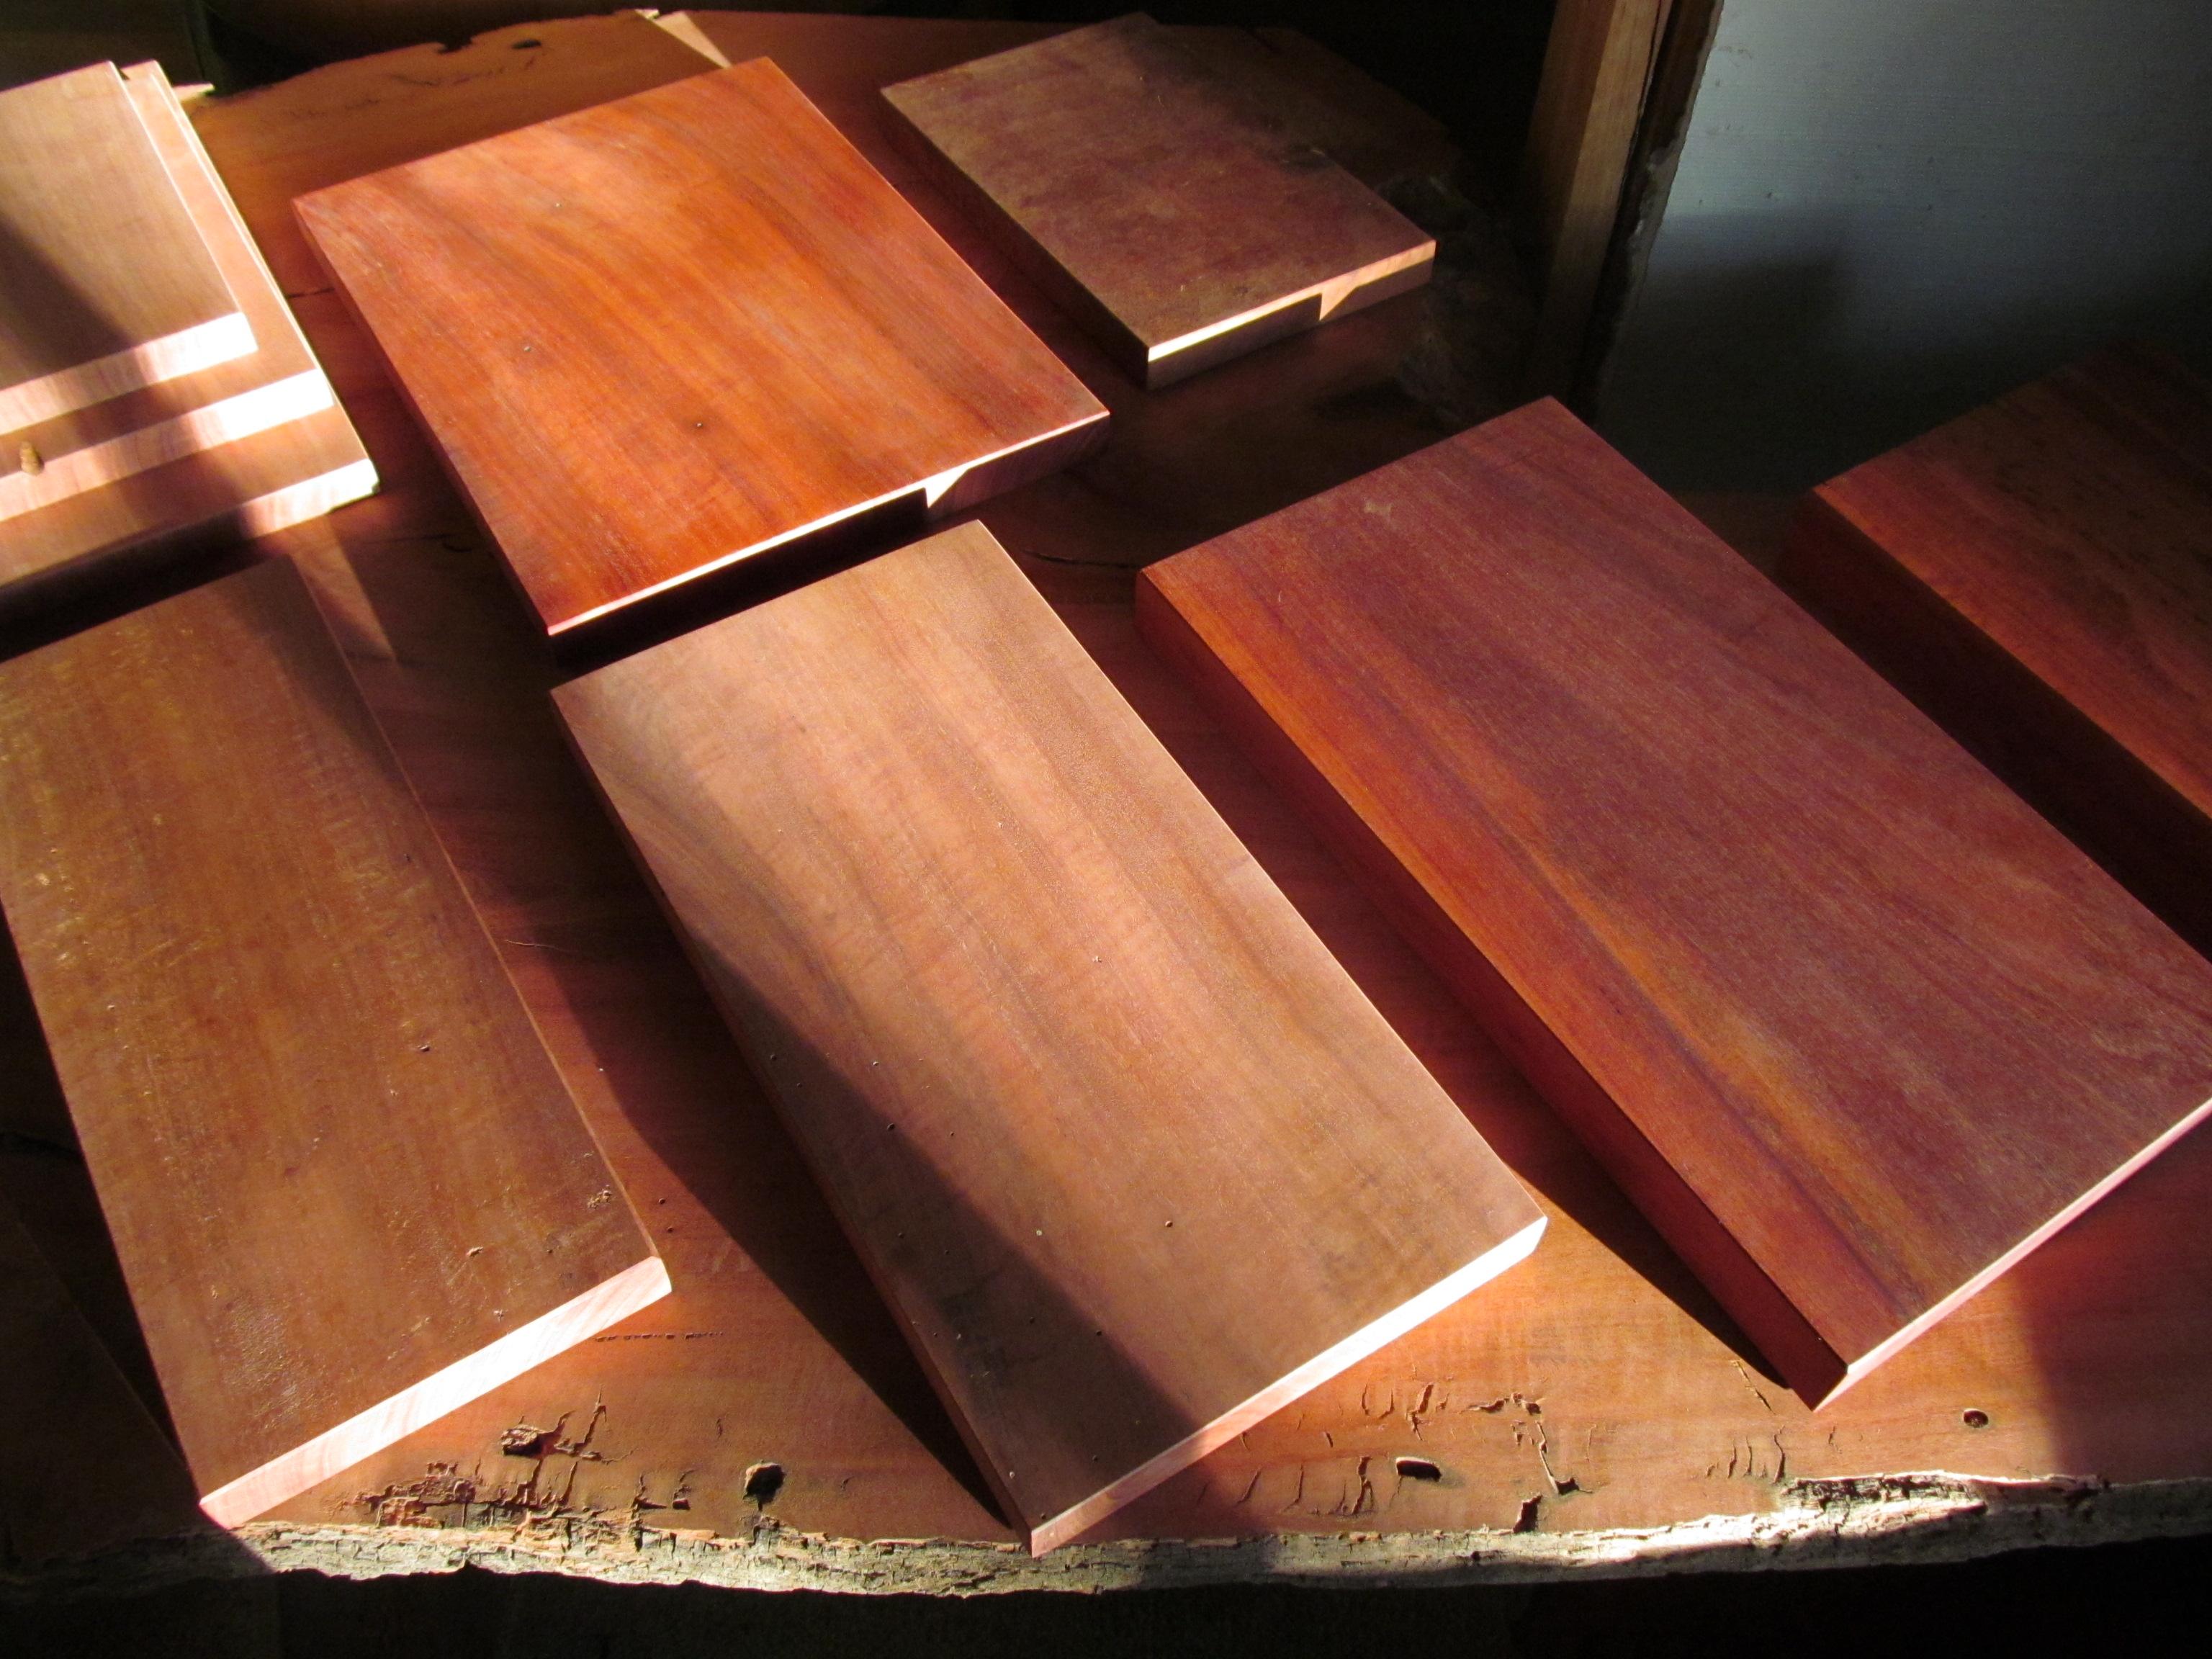 Cutting Boards.